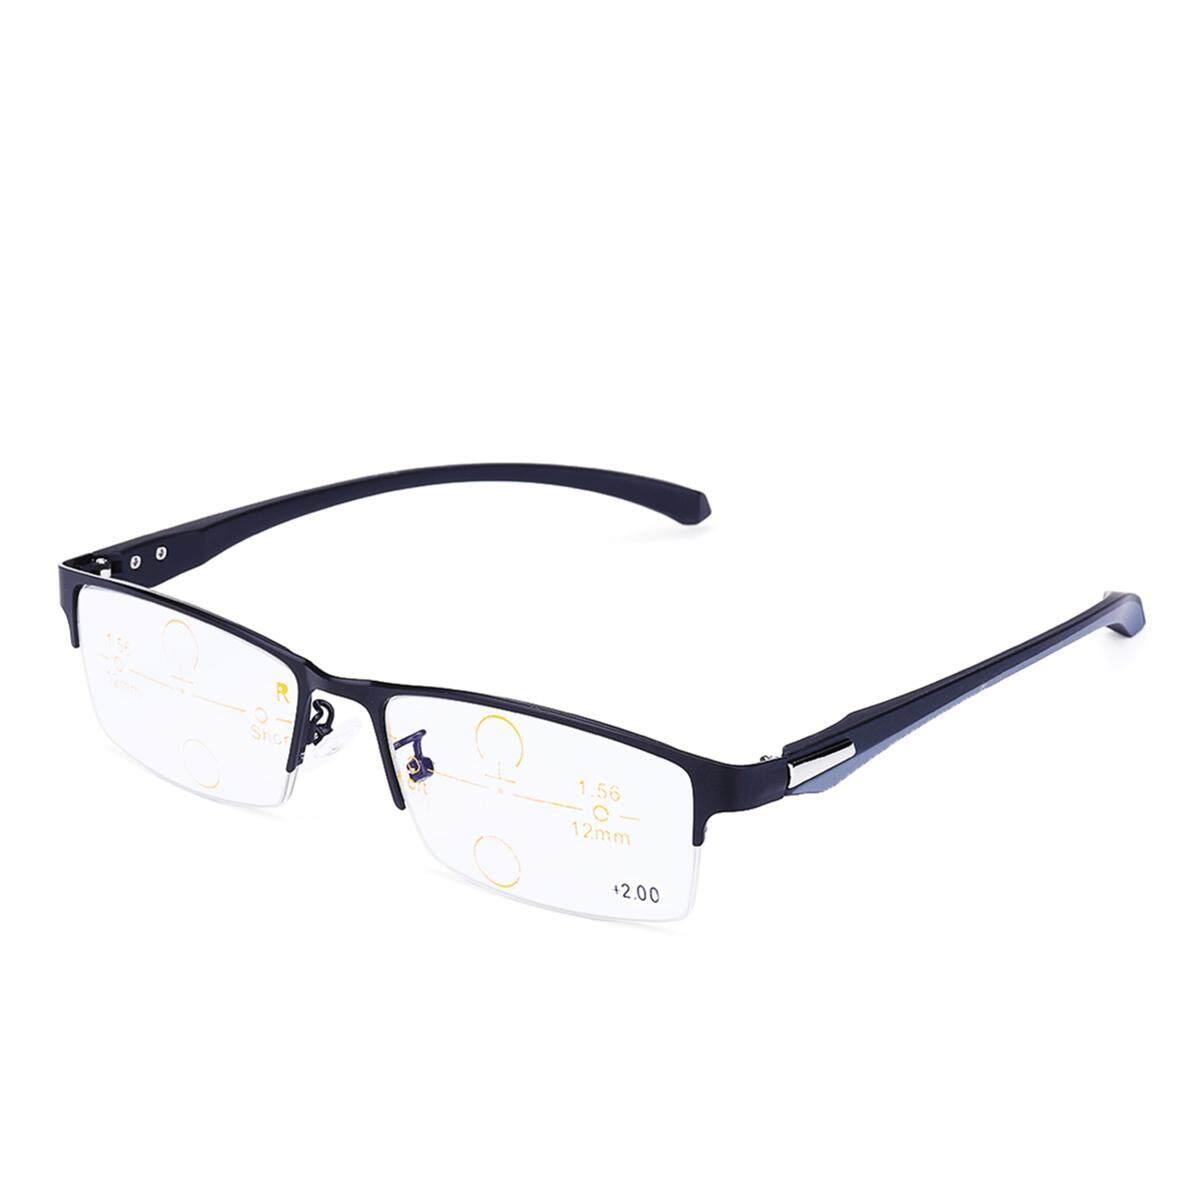 ac67bbb4c22 175 Degree Transition Photochromic Multi Focus Sun Presbyopic Progressive Reading  Glasses